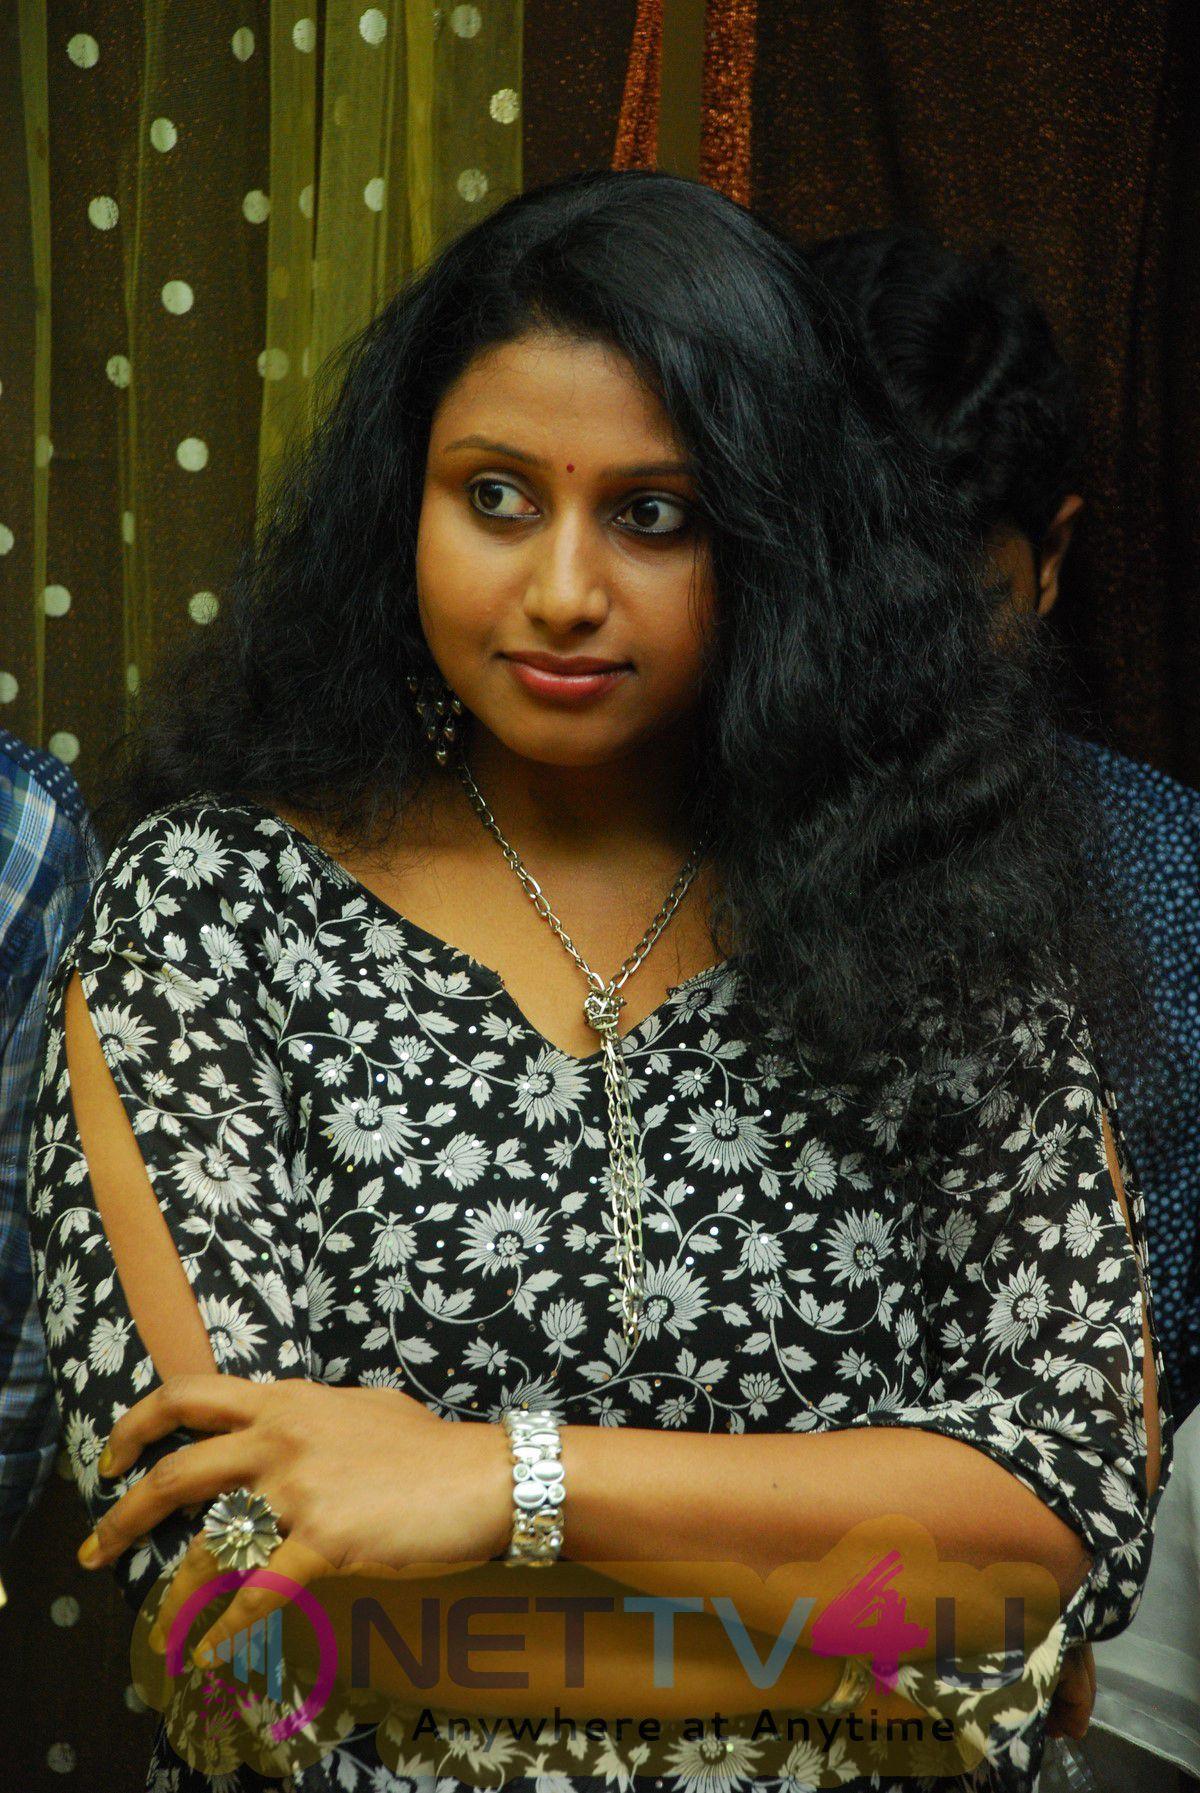 MeiMai Tamil Movie Glamorous Stills